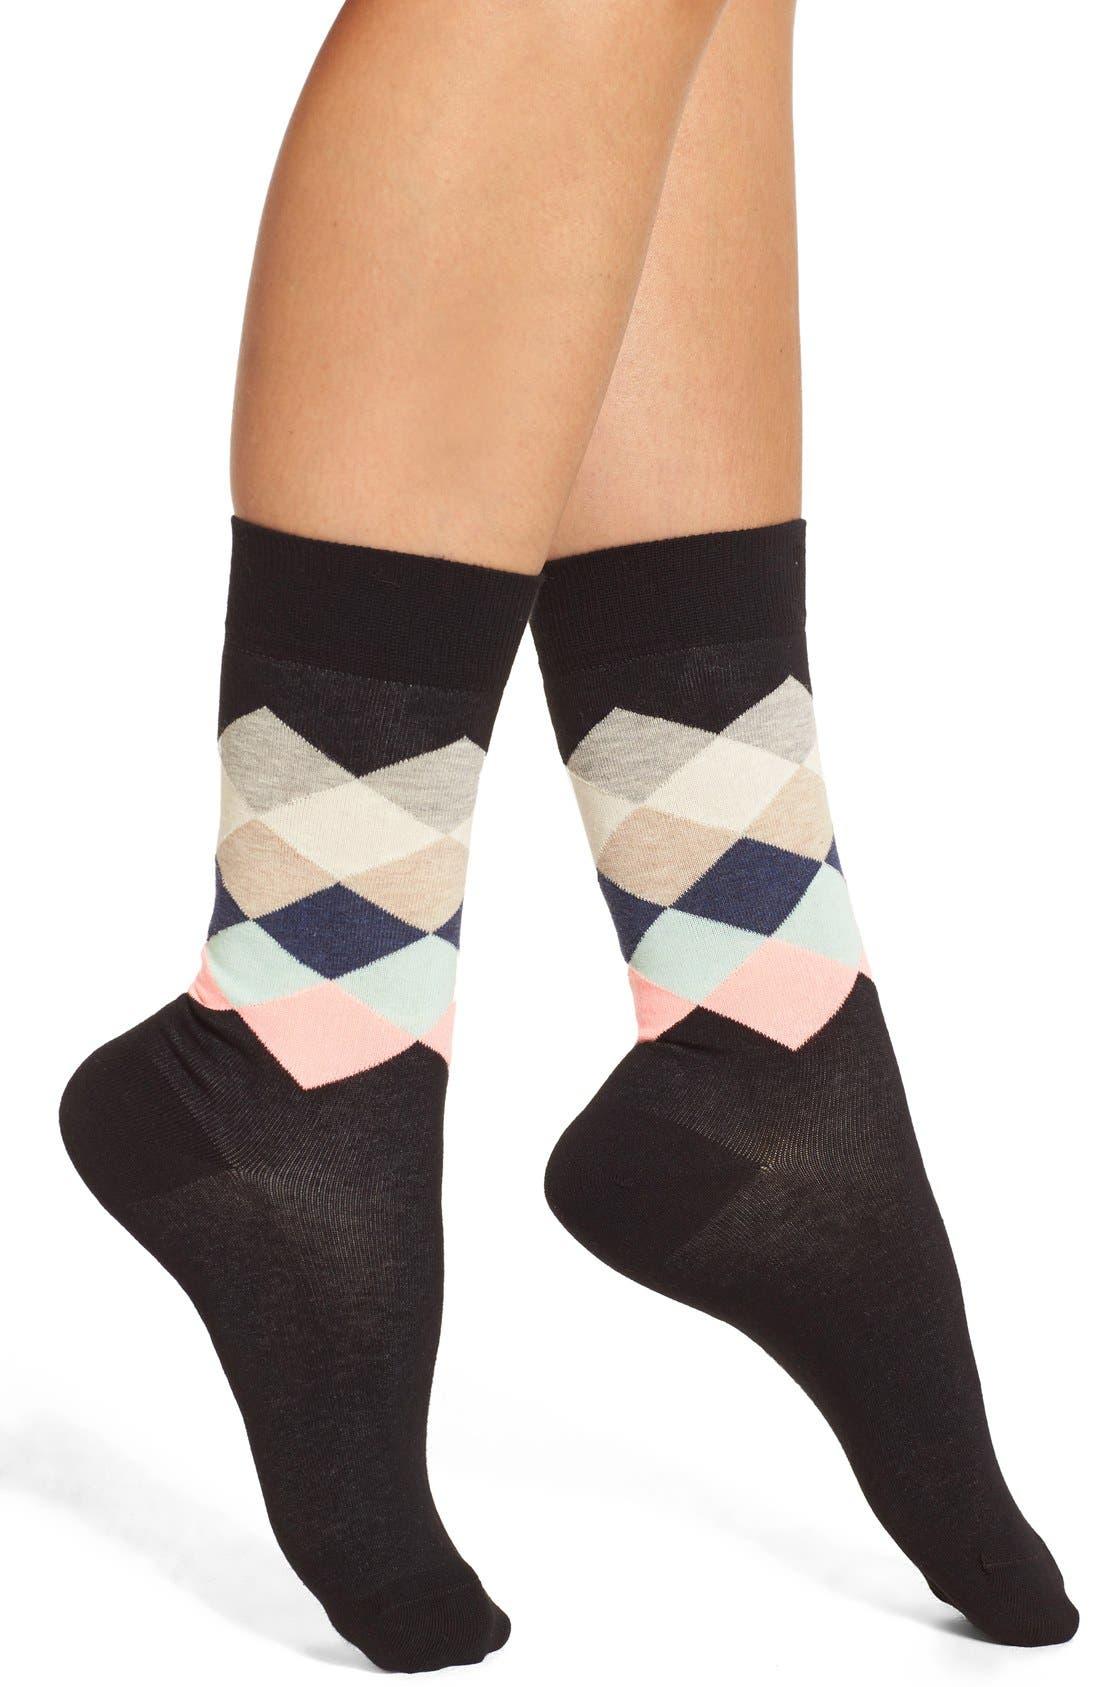 Happy Socks 'Faded Diamond' Crew Socks (3 for $24)